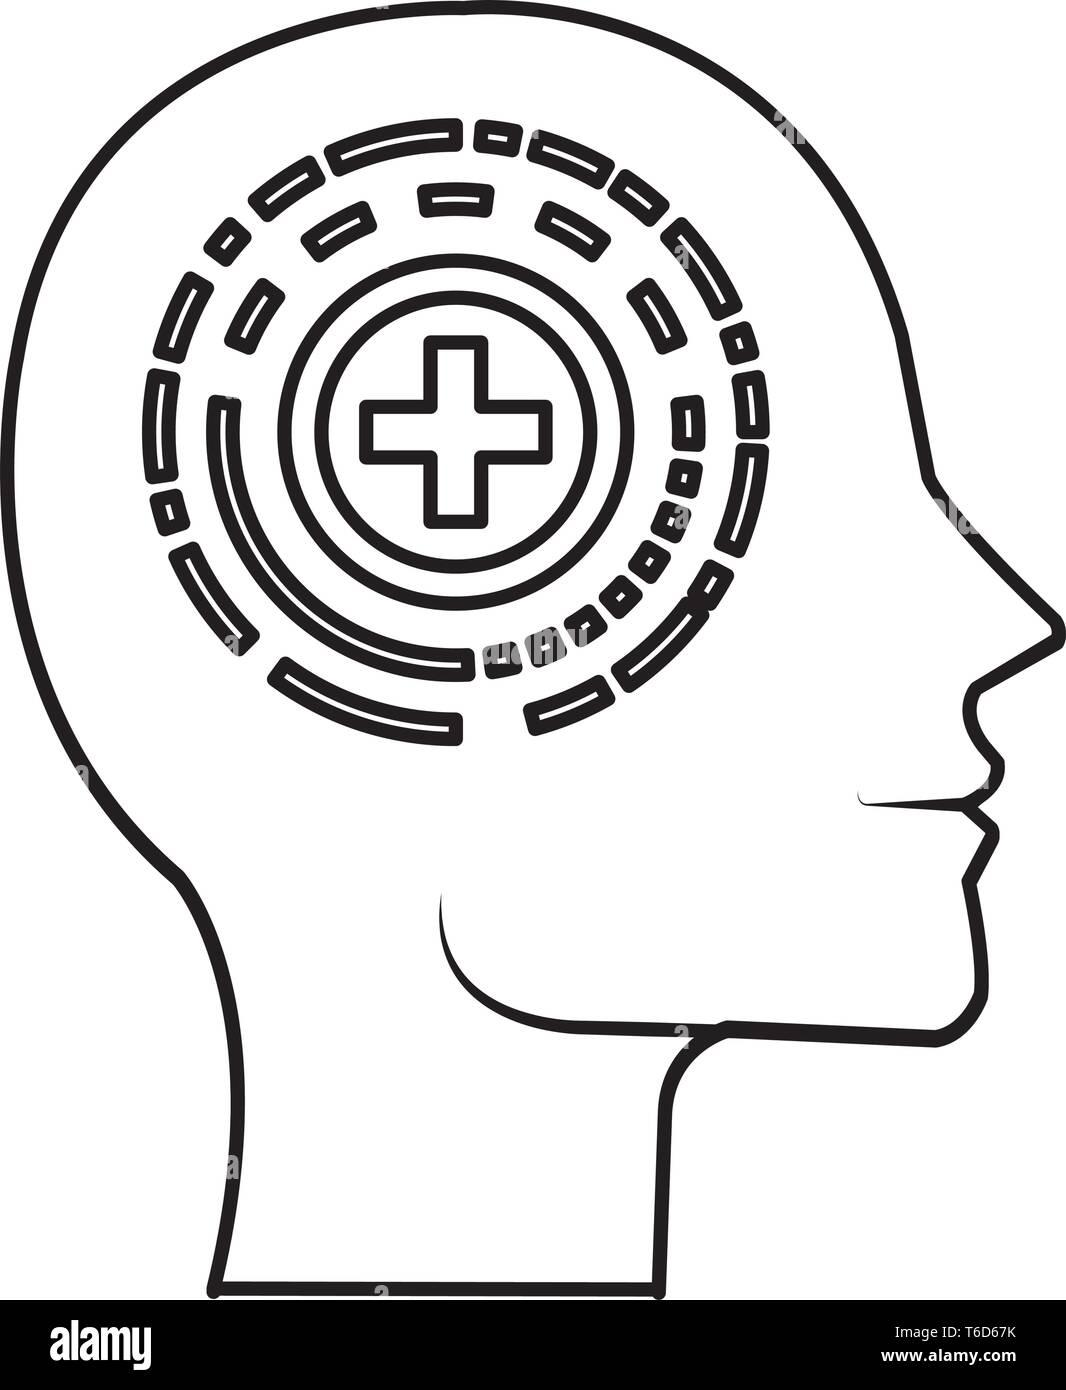 head profile with pluss symbol - Stock Image